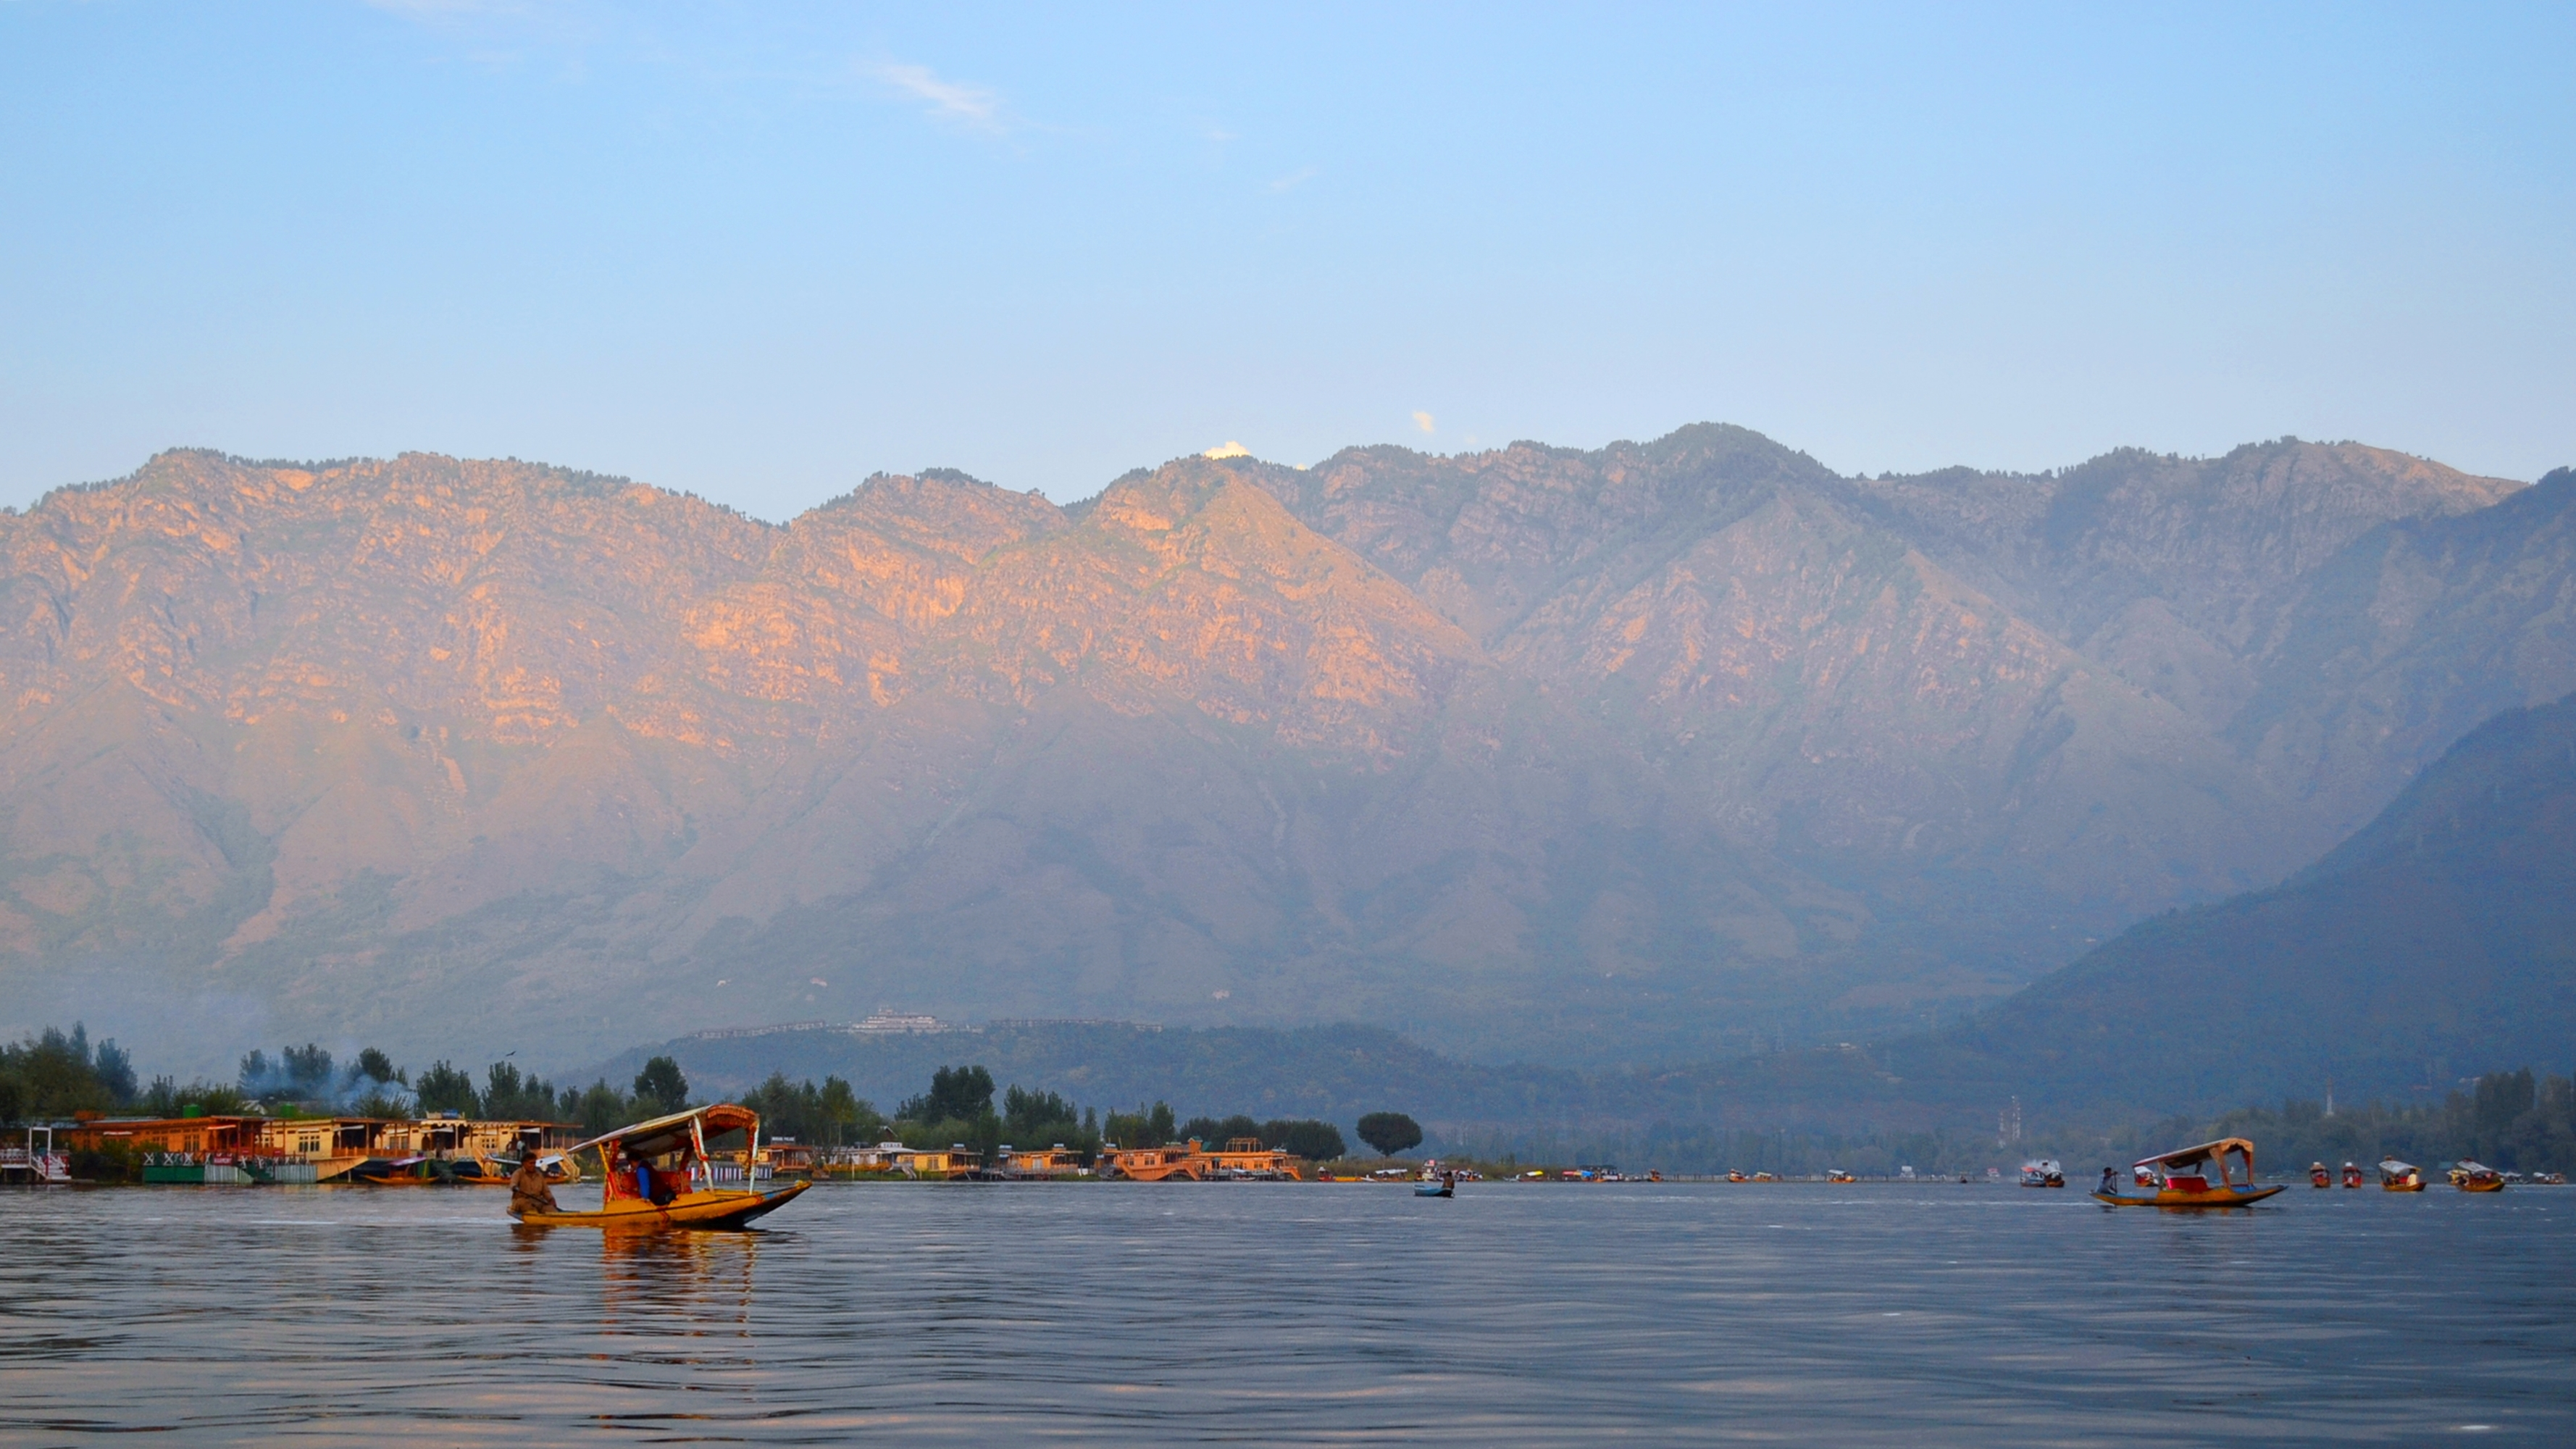 J&K to reopen for tourism soon: Principal Secretary Rohit Kansal